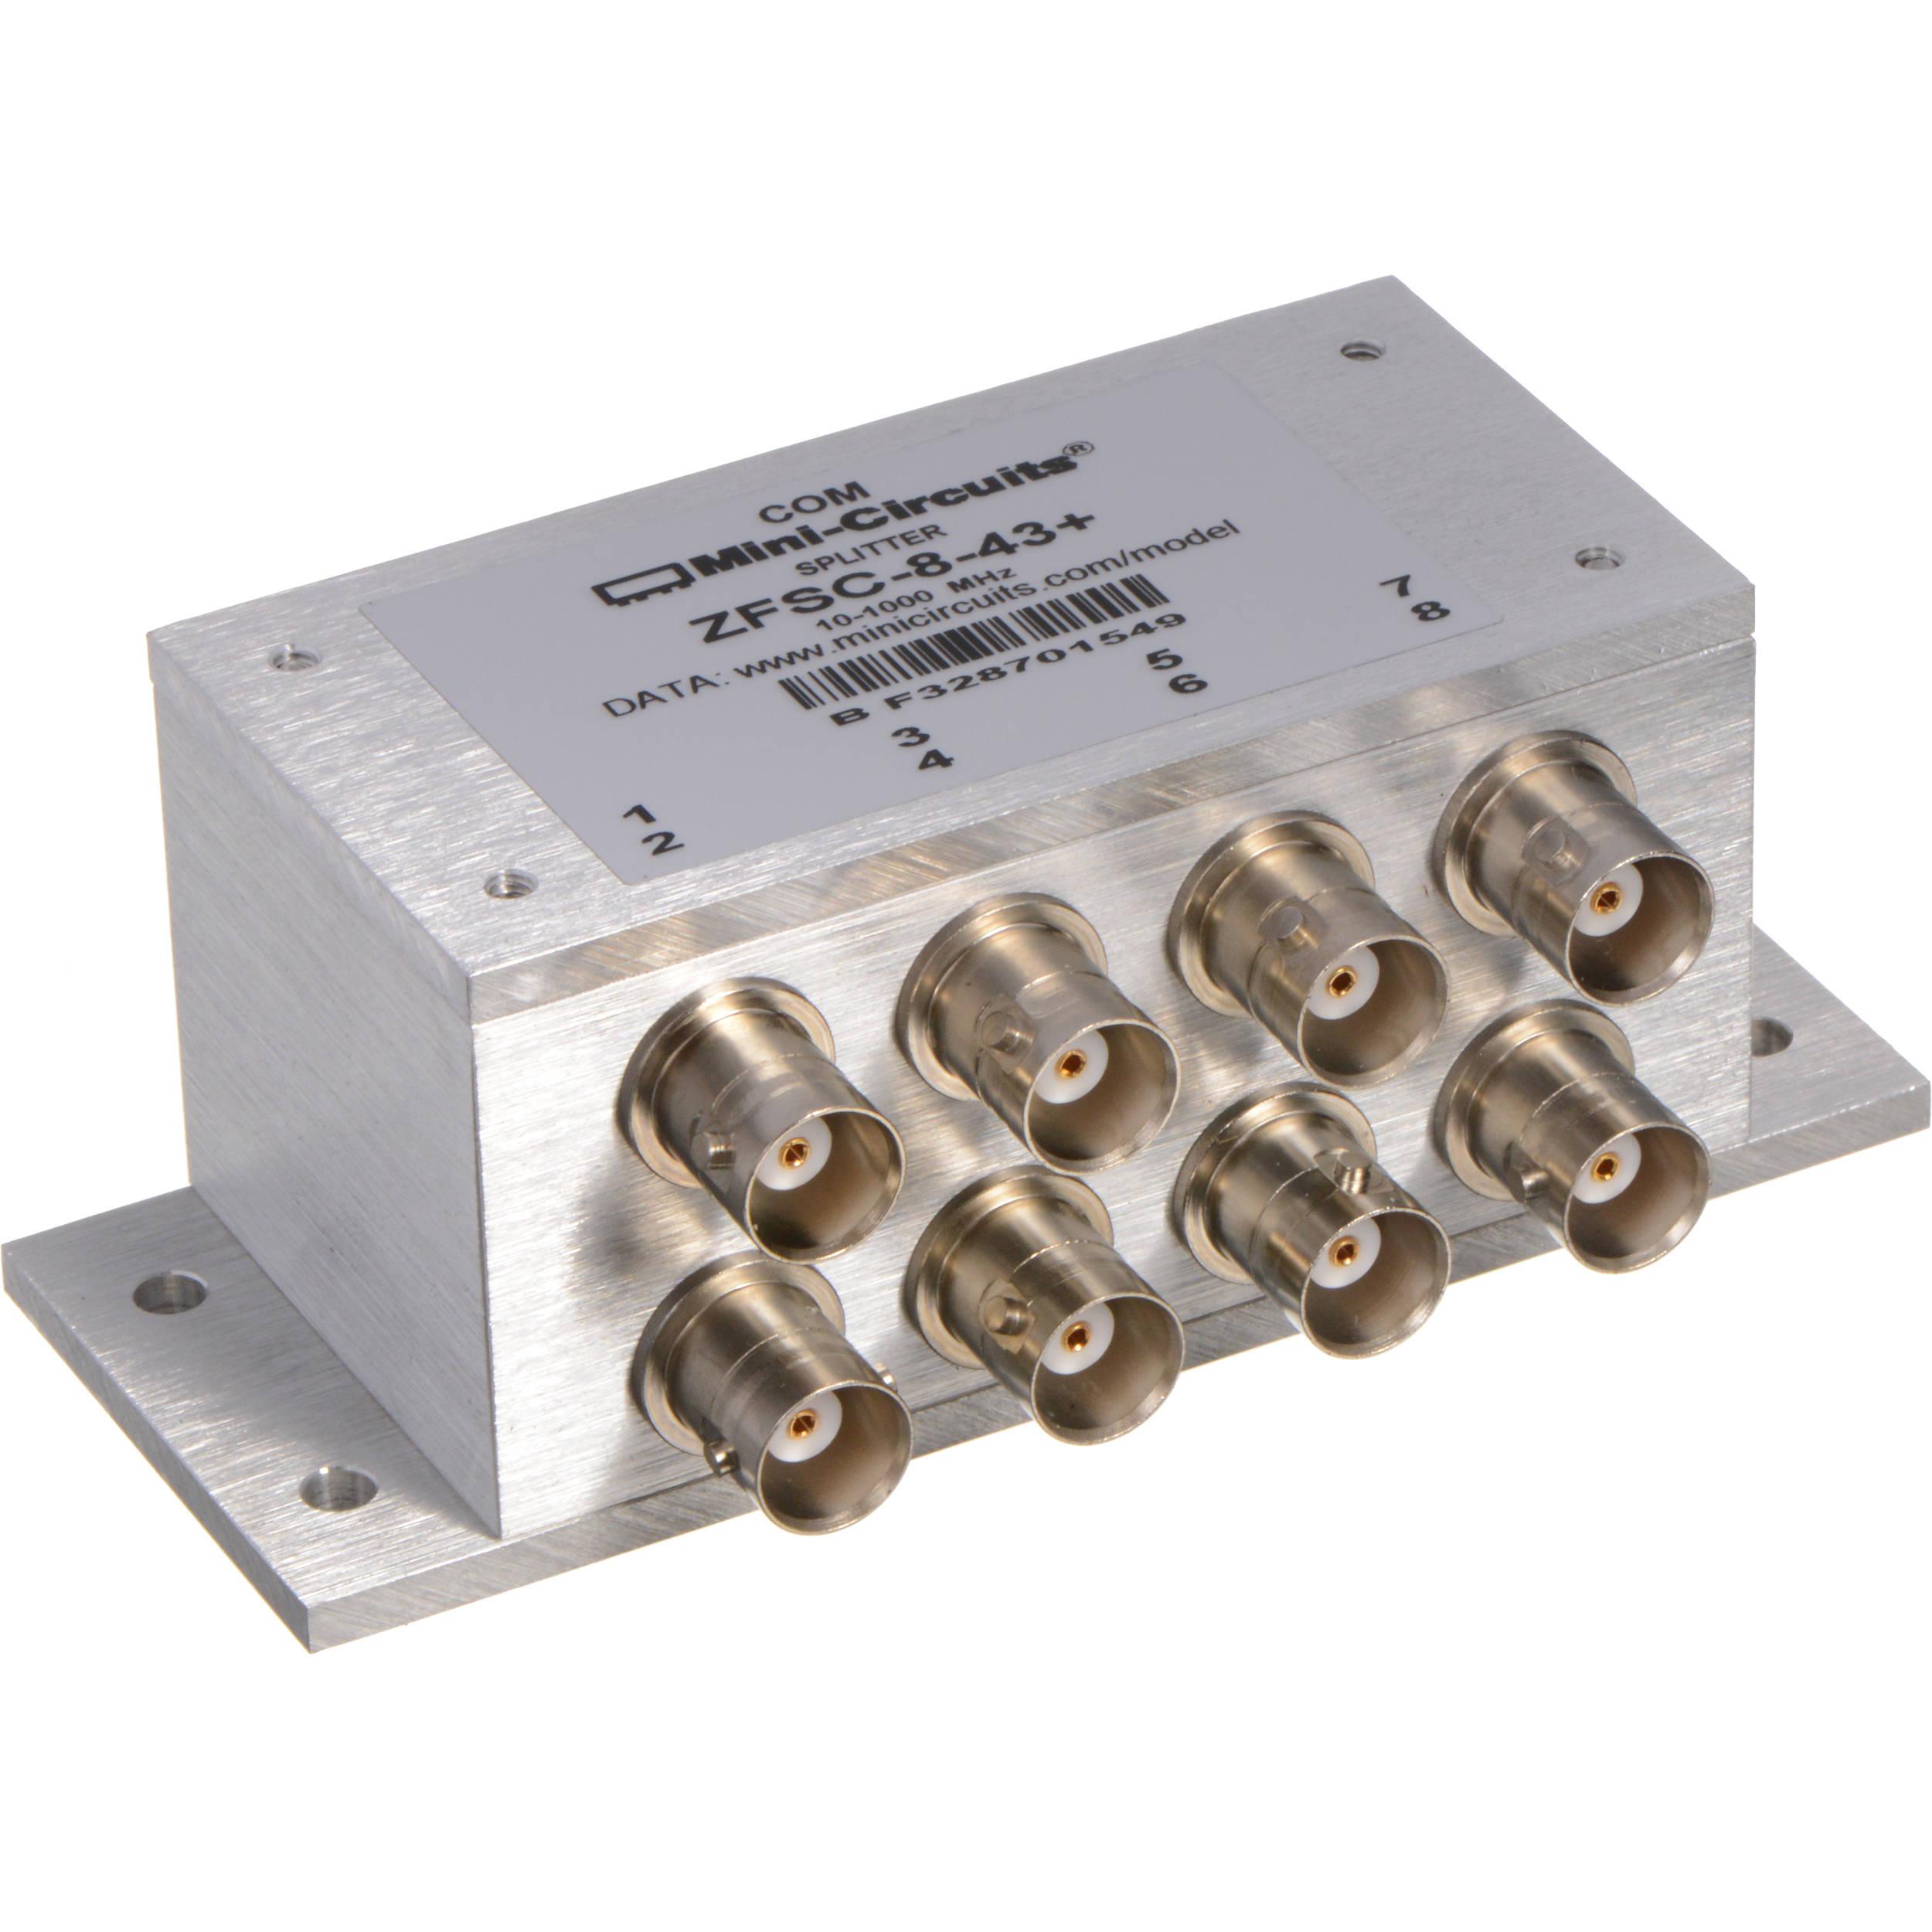 Lectrosonics ZFSC843 8-Way Passive RF Signal Splitter